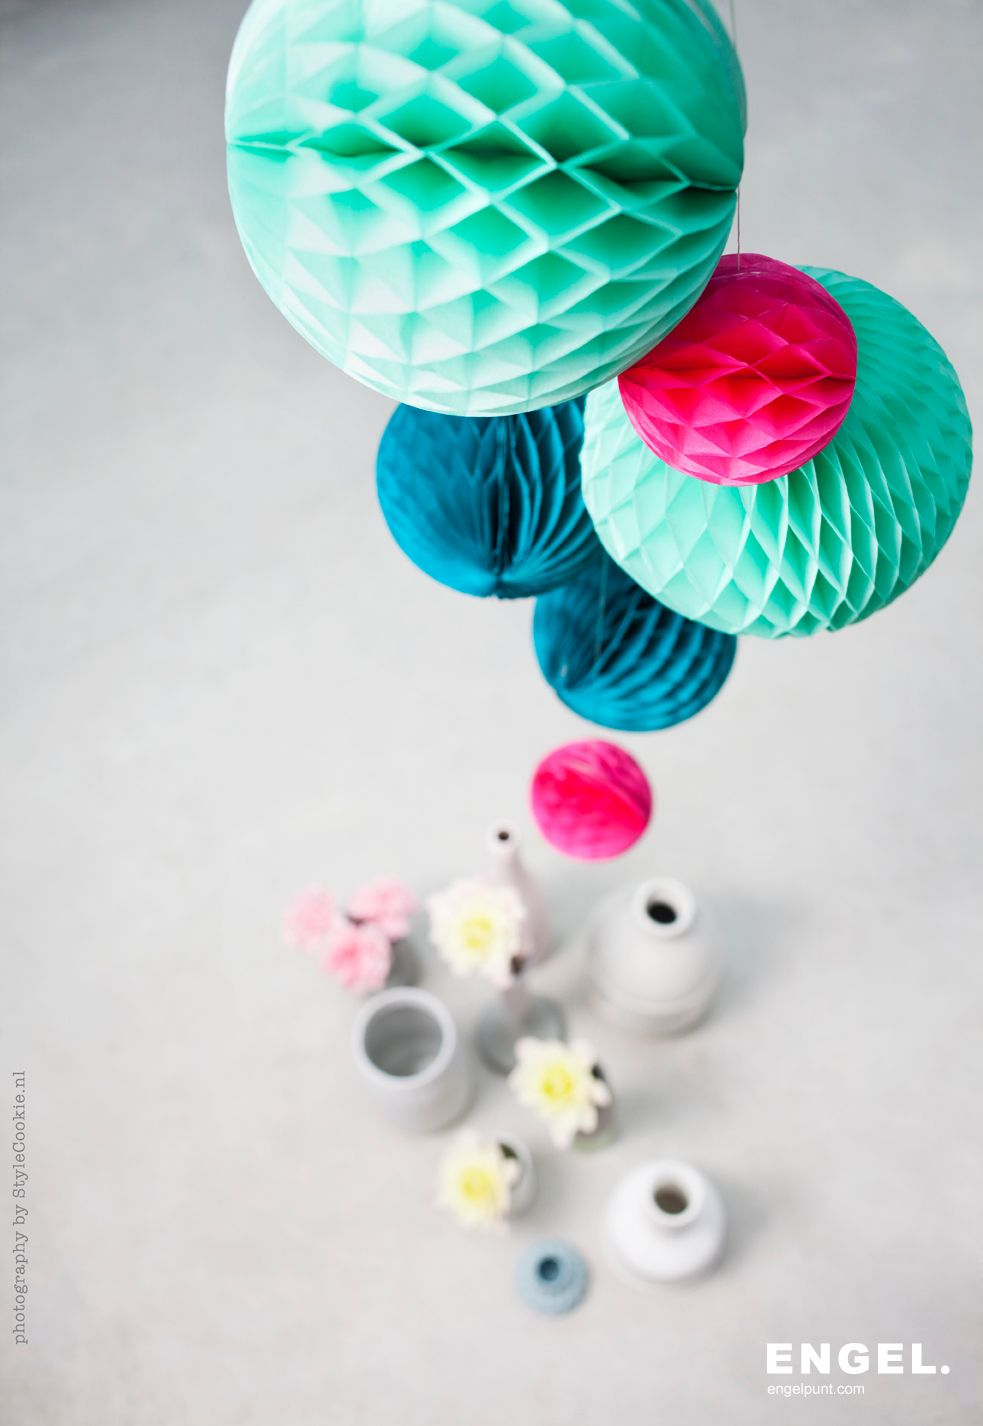 Ocean Honeycombset By Engel Photography And Styling By Stylecookie Nl Boule De Papier Objet Decoration Decorations De Table De Fete